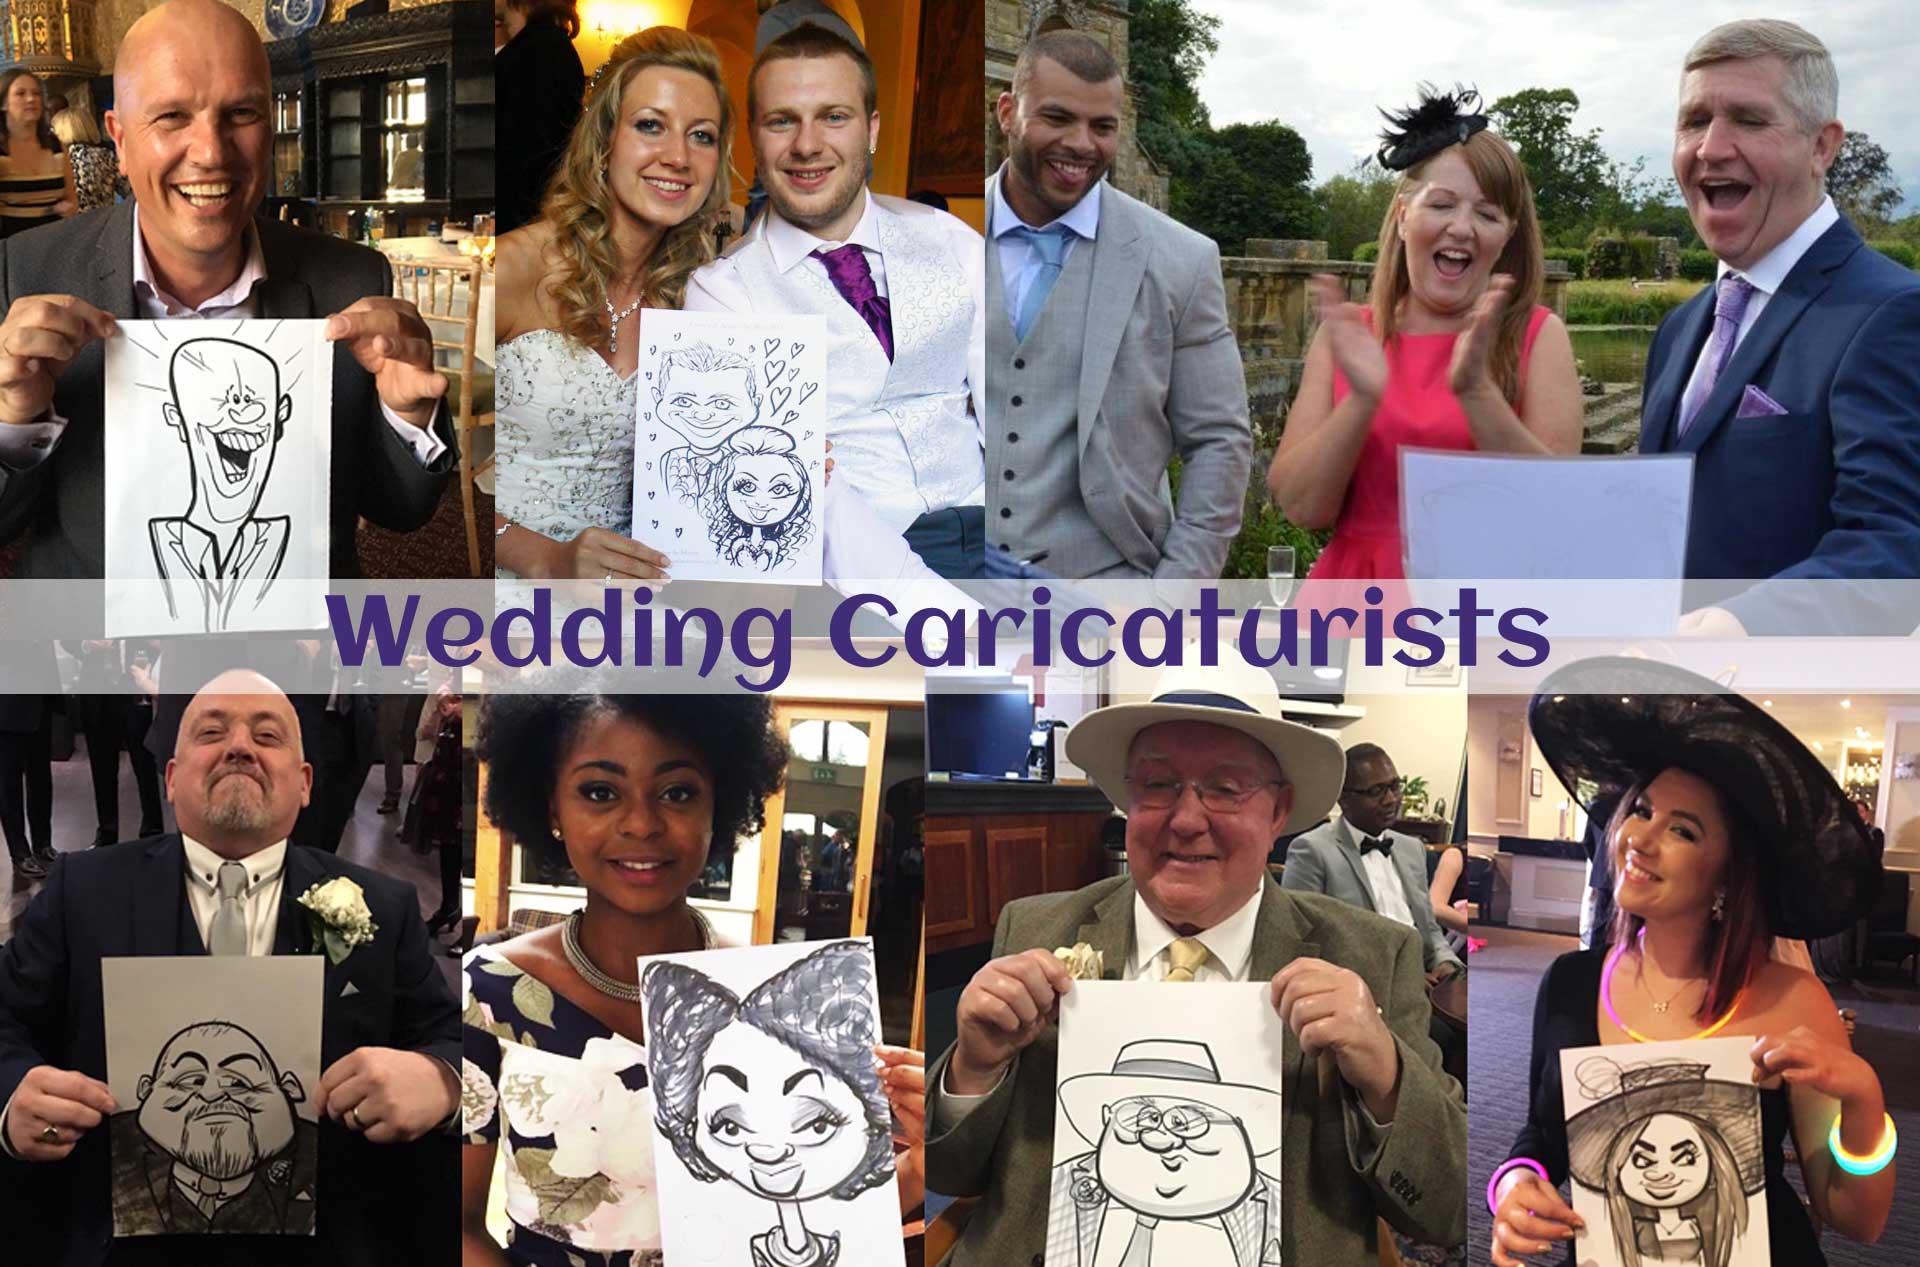 Wedding Caricaturists